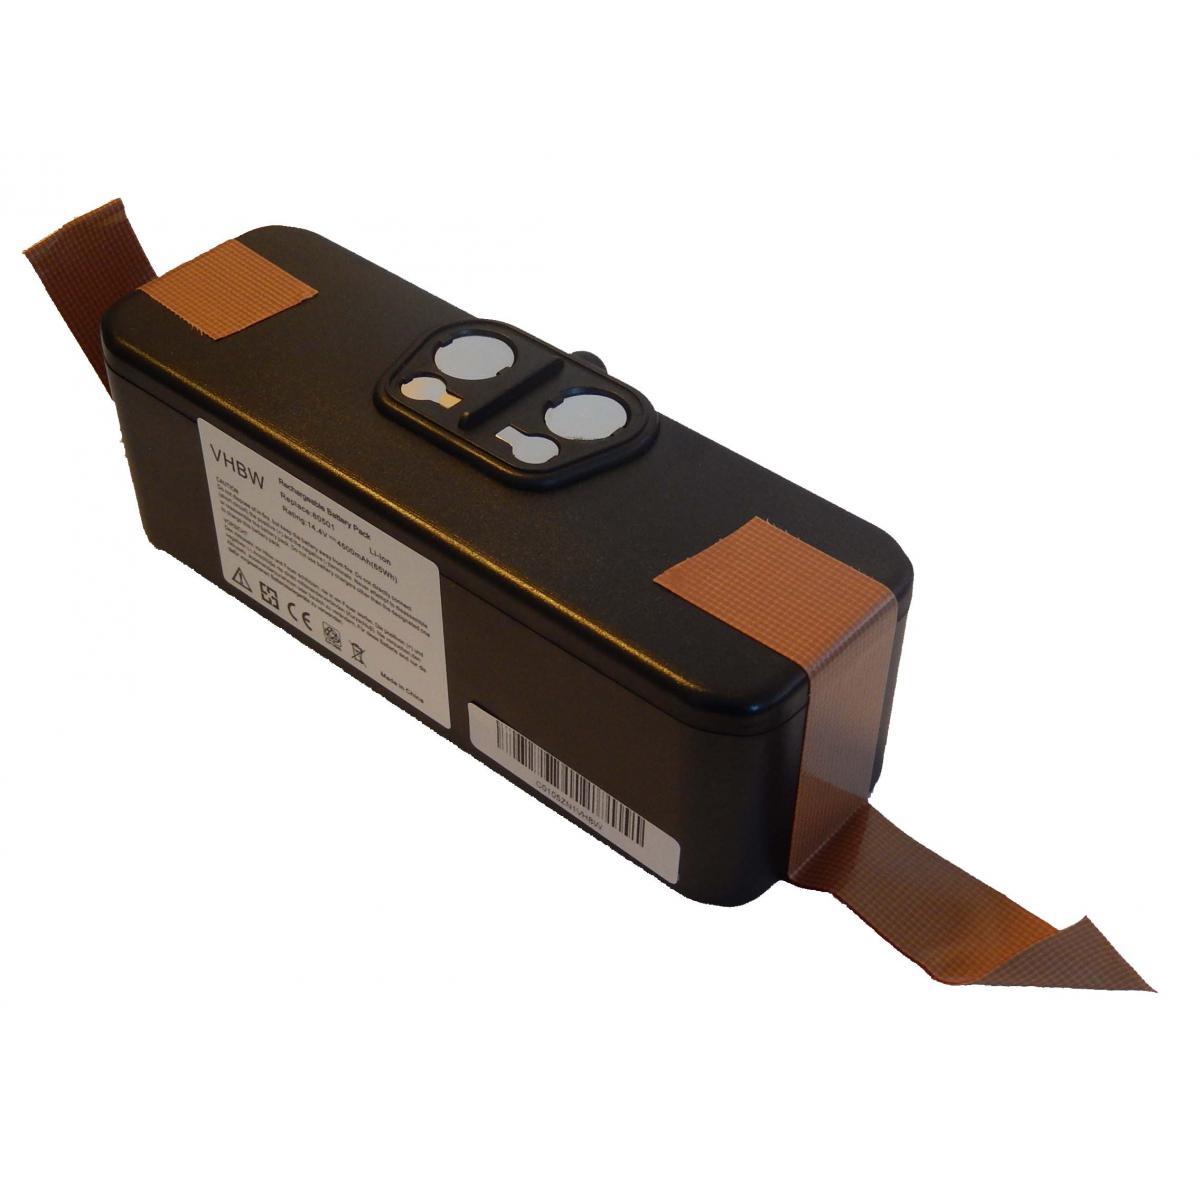 Vhbw vhbw Batterie Li-Ion 4500mAh (14.4V) compatible avec iRobot Roomba 605, 615, 616, 621, 651 aspirateur remplace 11702, GD